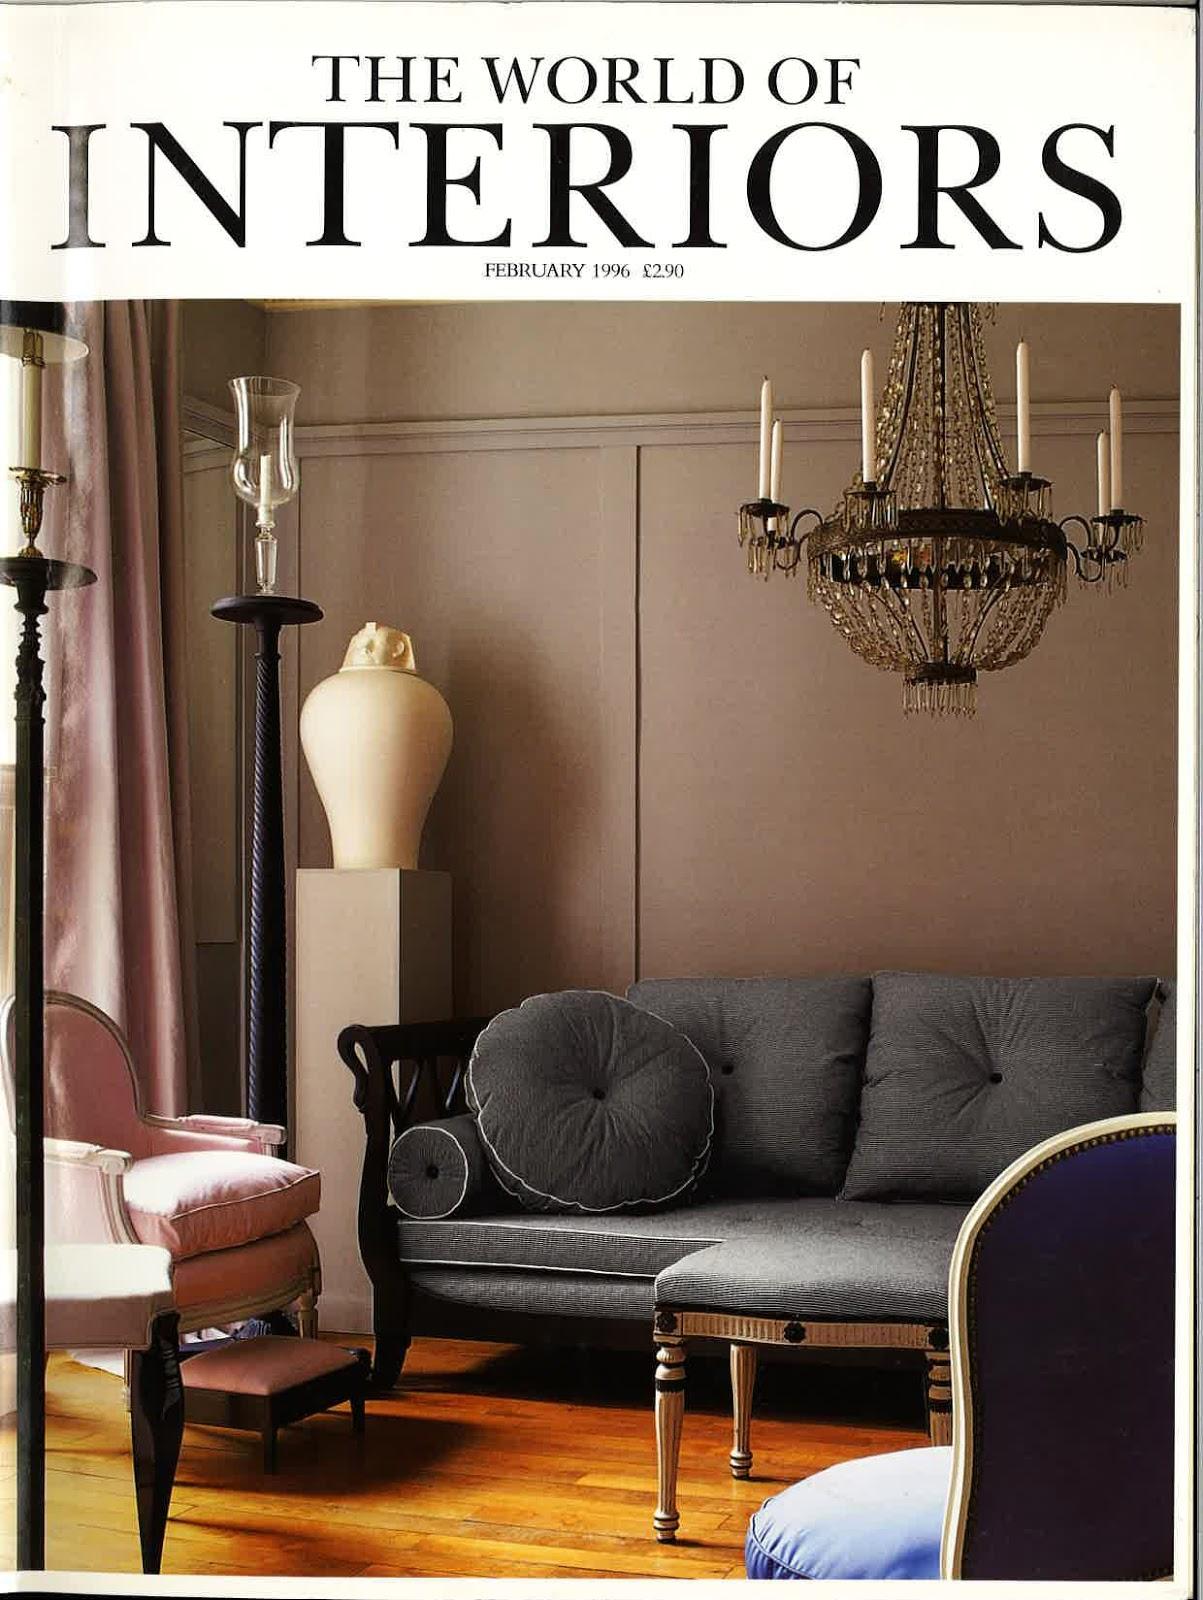 THE WORLD OF INTERIORS | FEBRUARY 1996